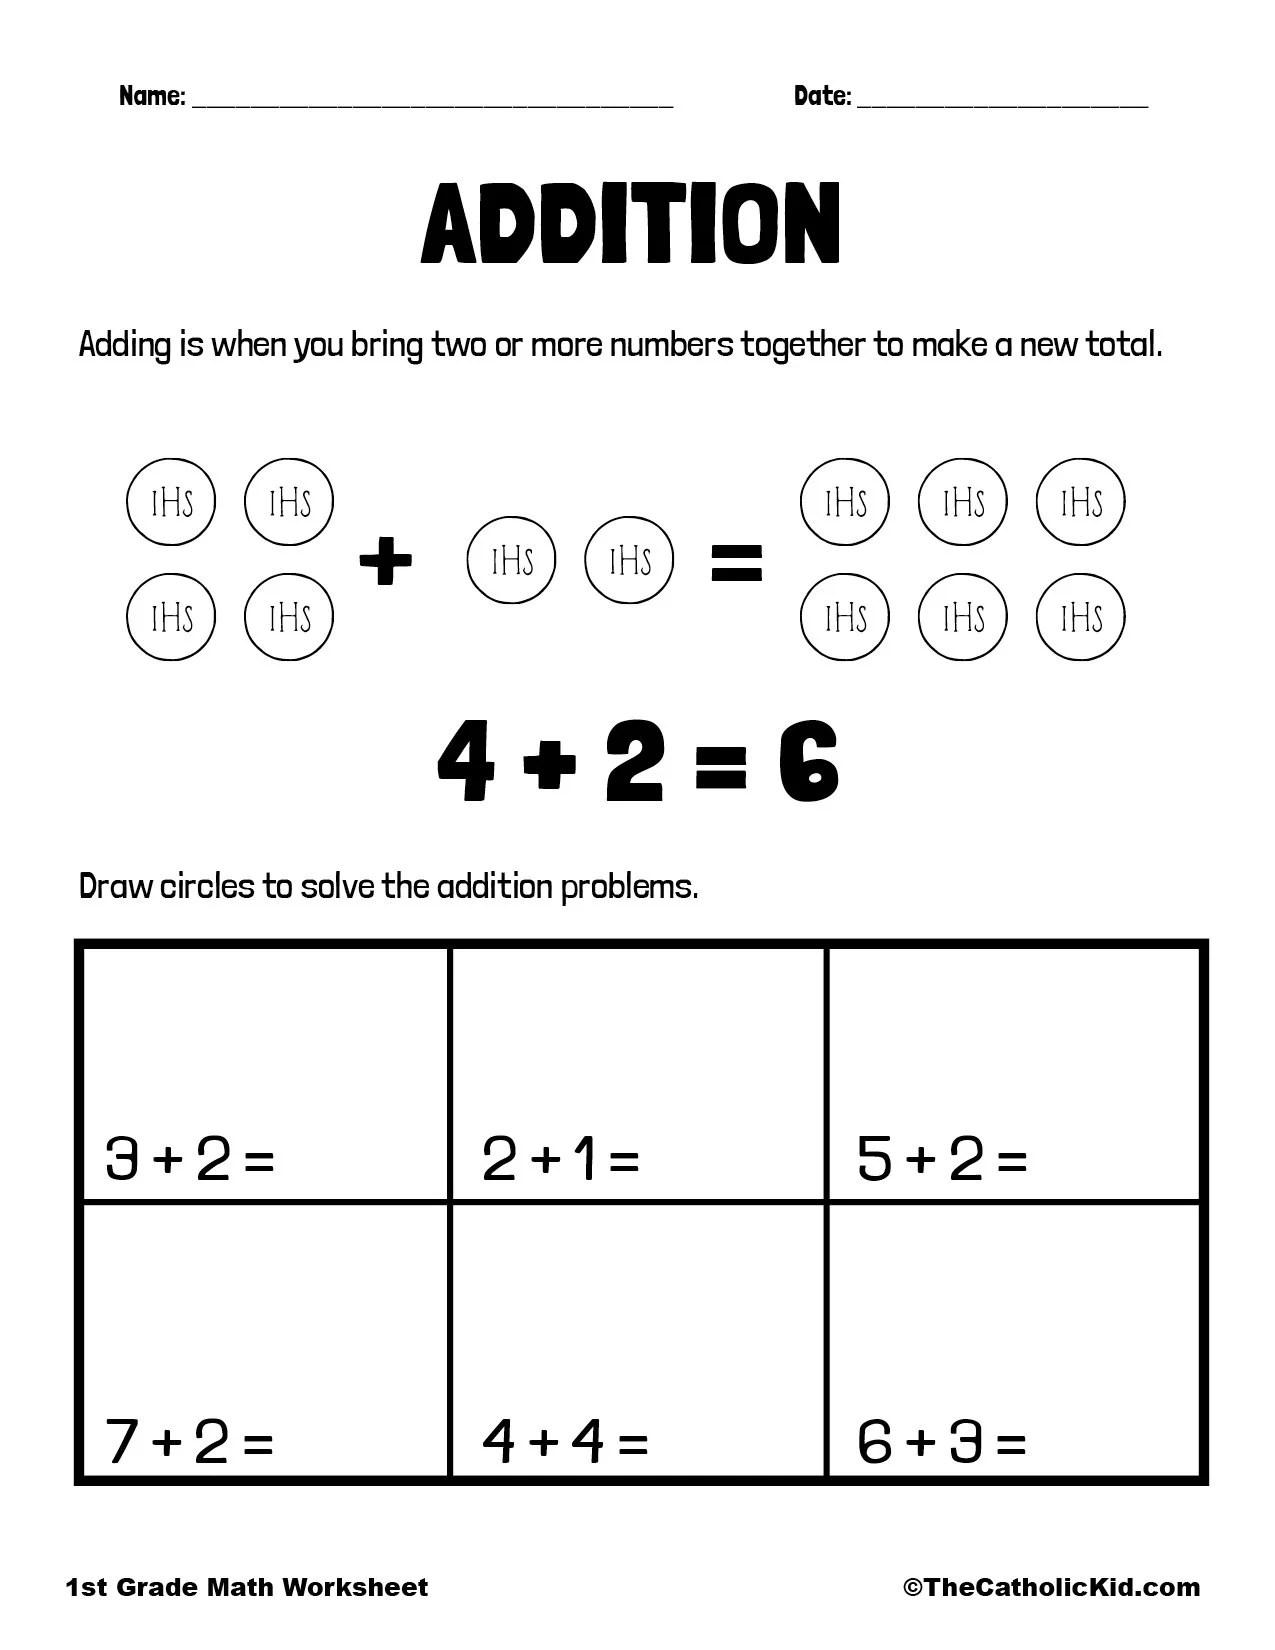 hight resolution of Addition - 1st Grade Math Worksheet Catholic - TheCatholicKid.com